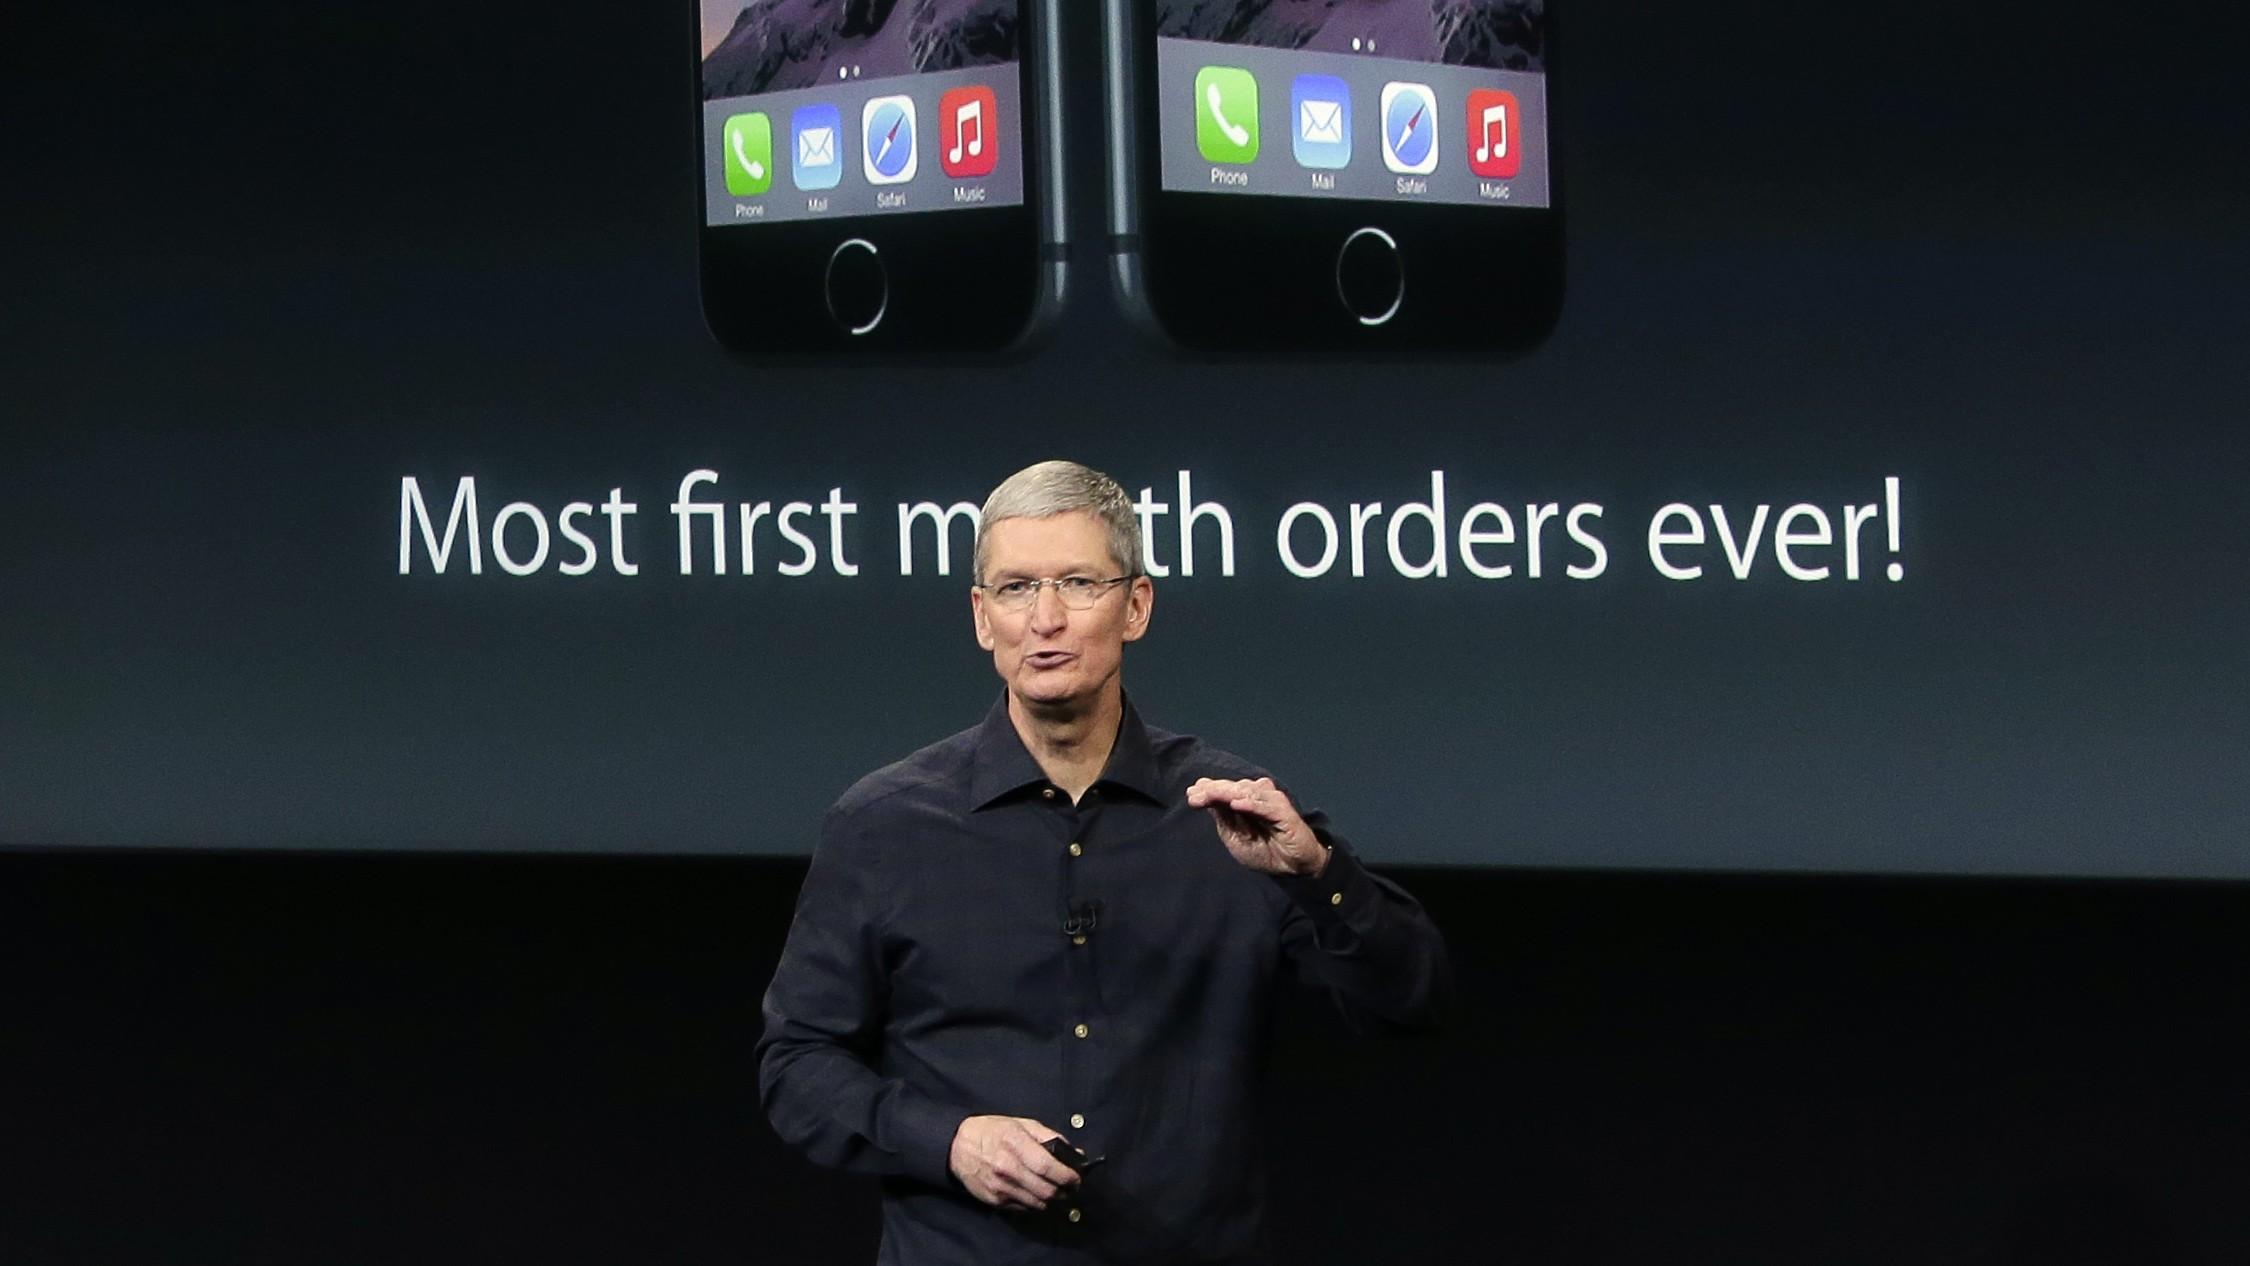 Tim Cook iPhone orders